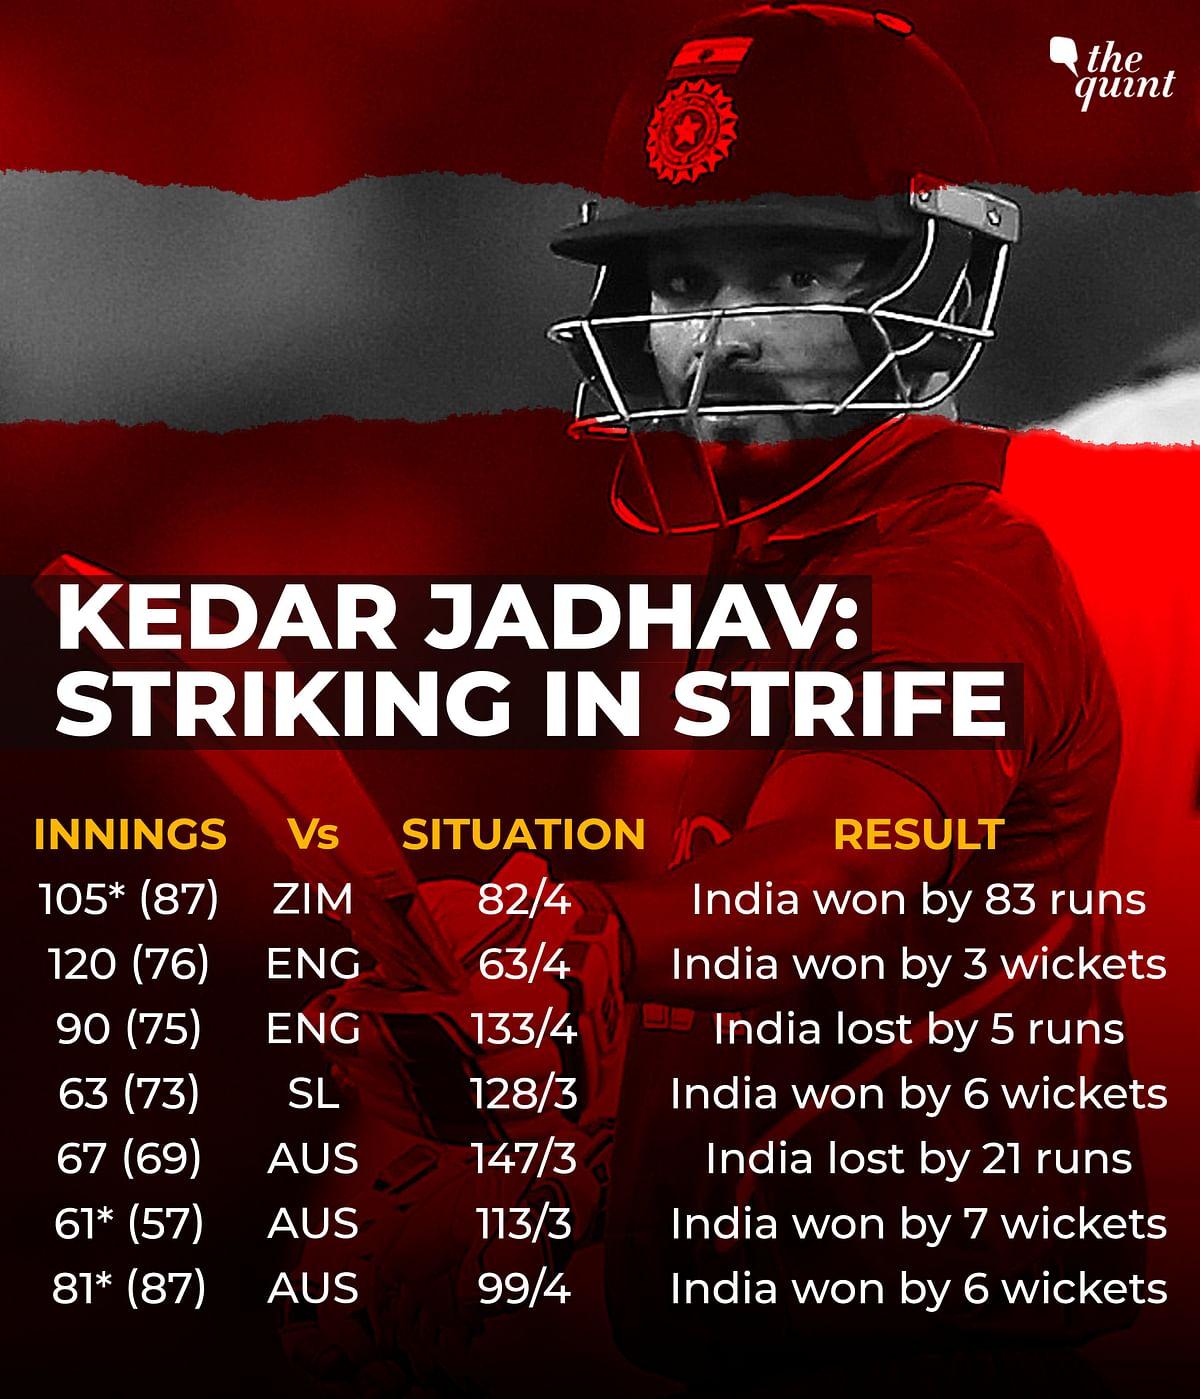 Kedar Jadhav's seven 50+ scores in ODIs broken down.